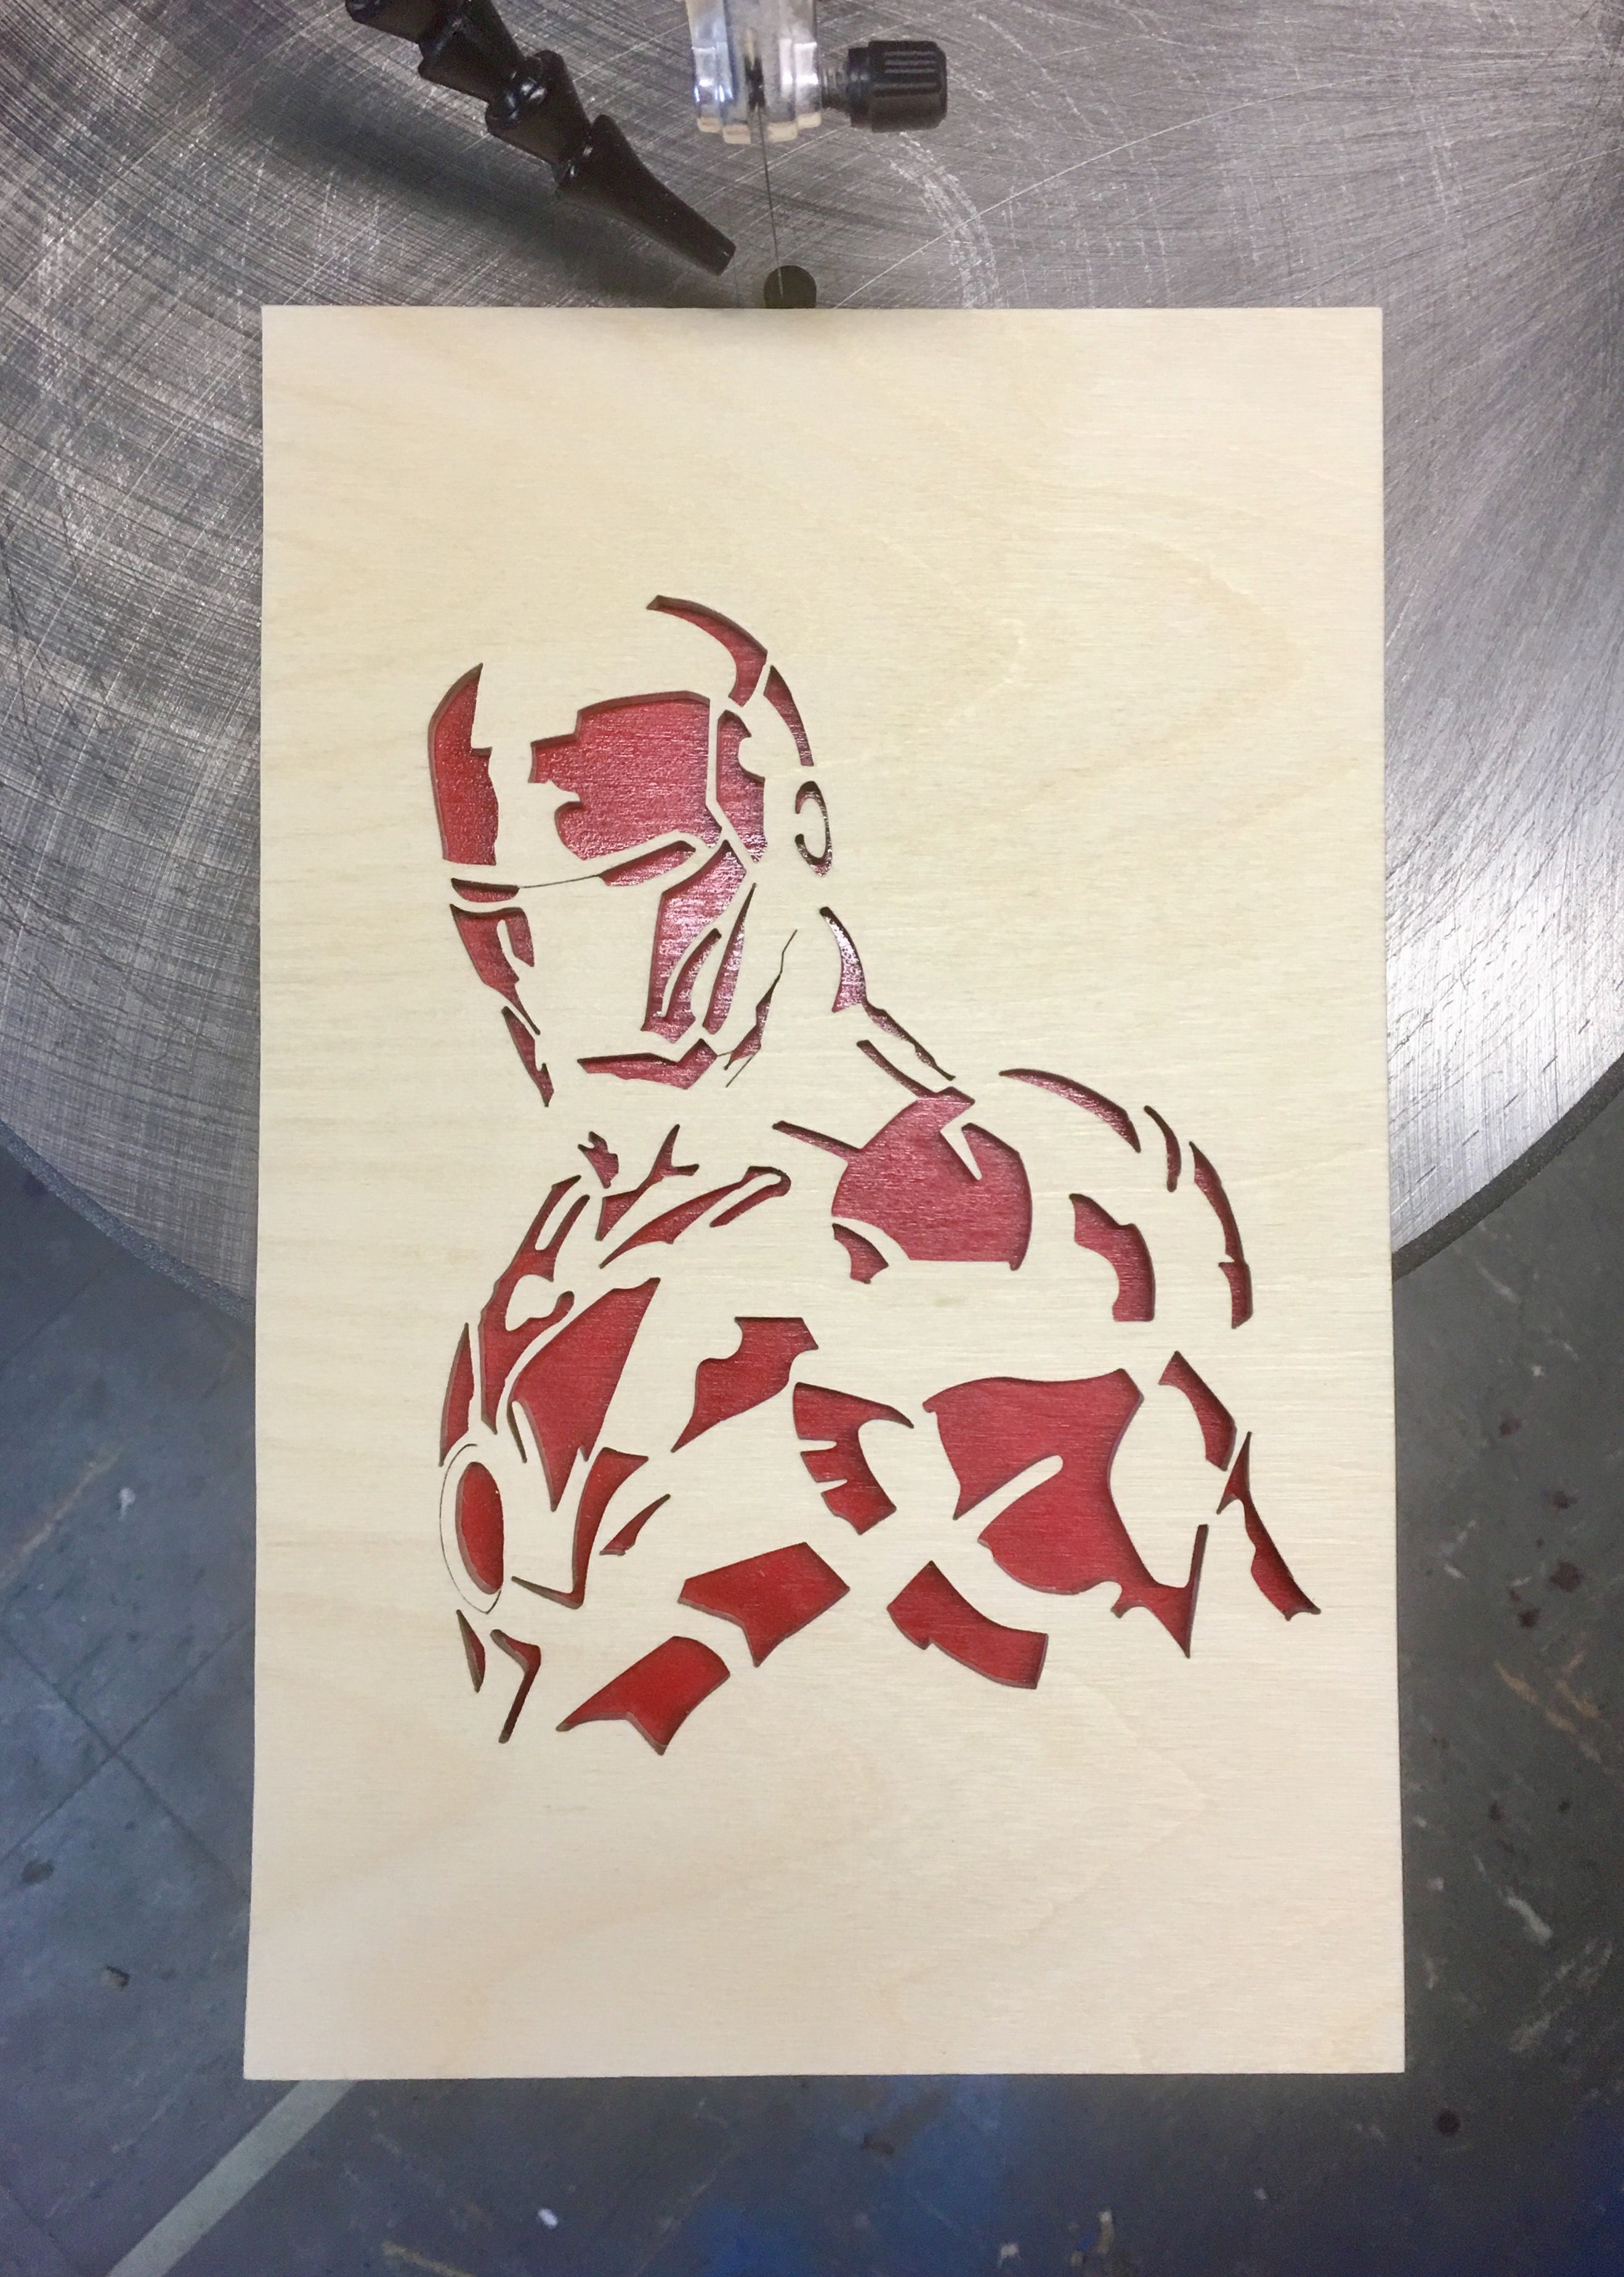 Admirable Ironman 2.0 | Scroll saw patterns, Wood art, Scroll saw KX-24